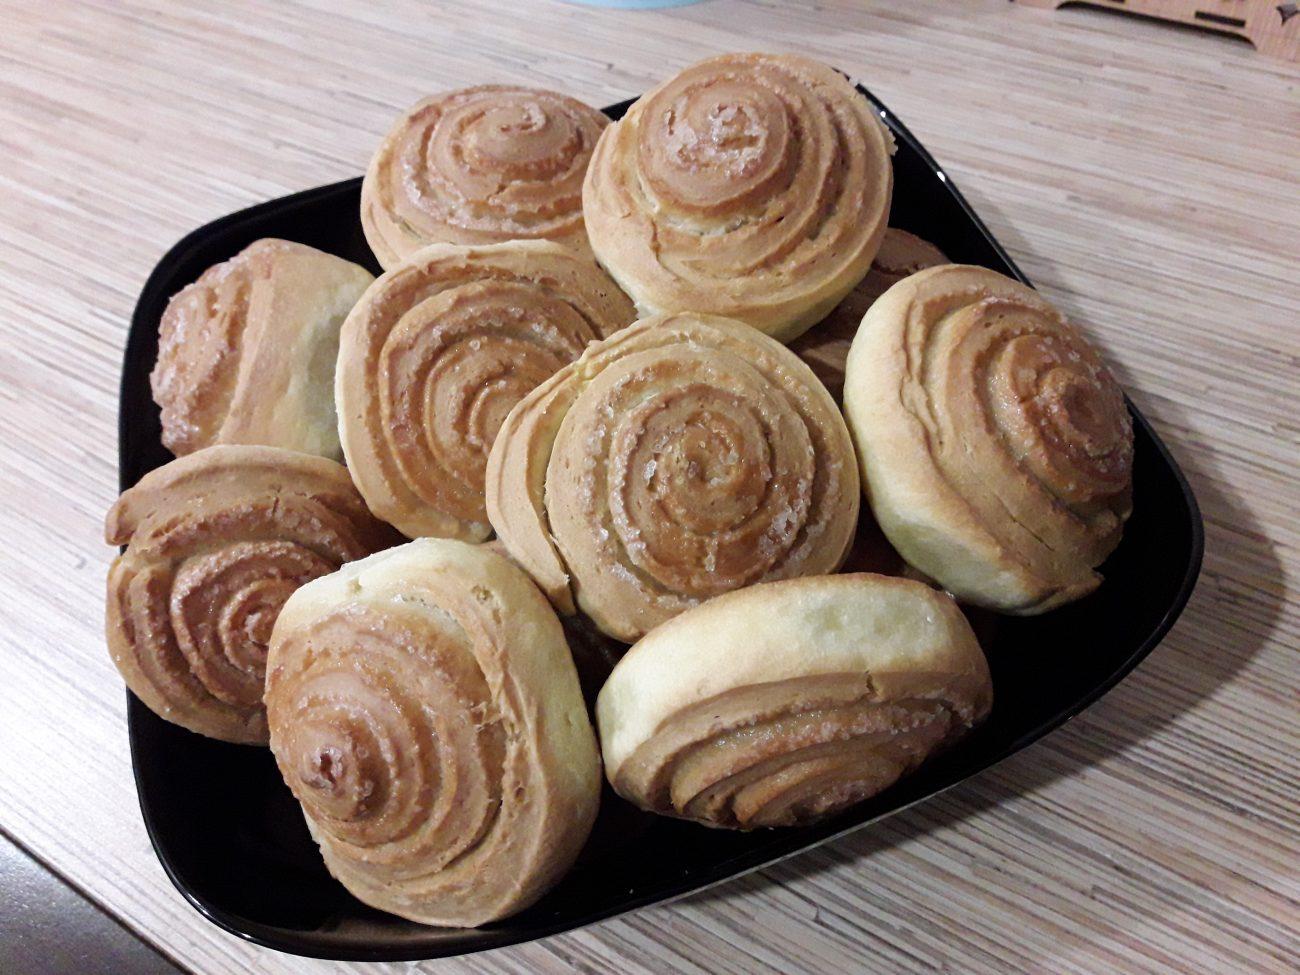 Французские булочки из дрожжевого теста с сахаром